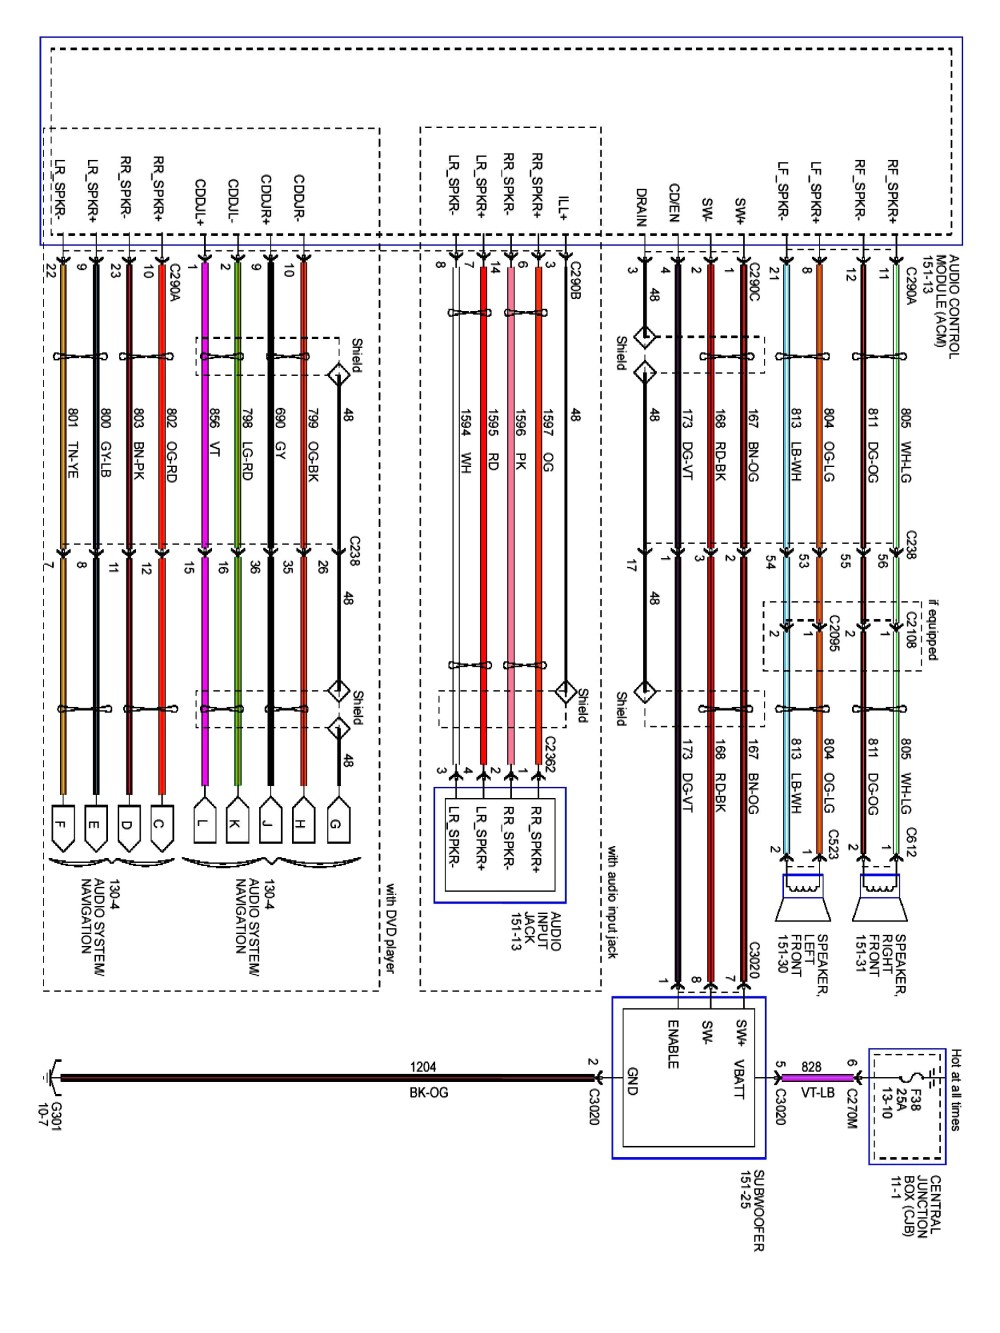 medium resolution of 2002 ford f150 trailer wiring diagram collection 2002 ford f 250 super duty trailer wiring